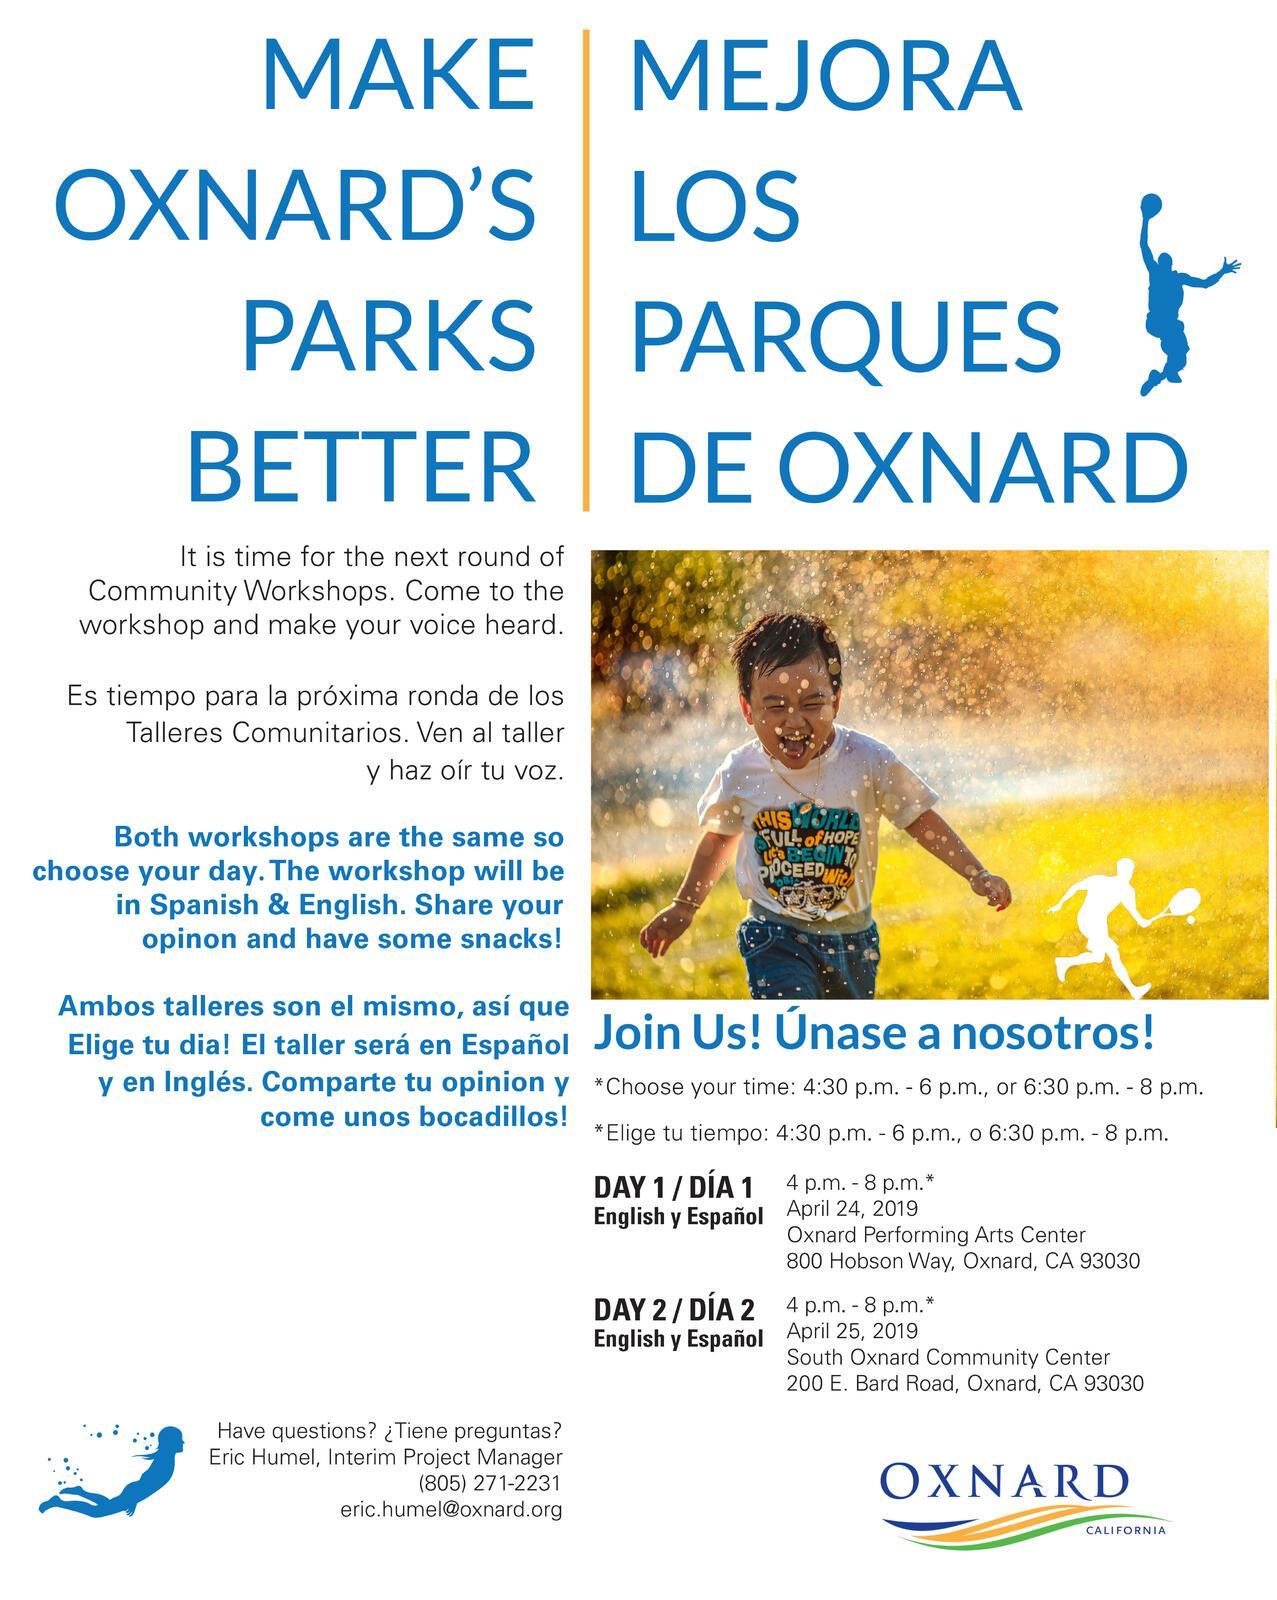 Make Oxnard's Parks Better (City of Oxnard) &mdash